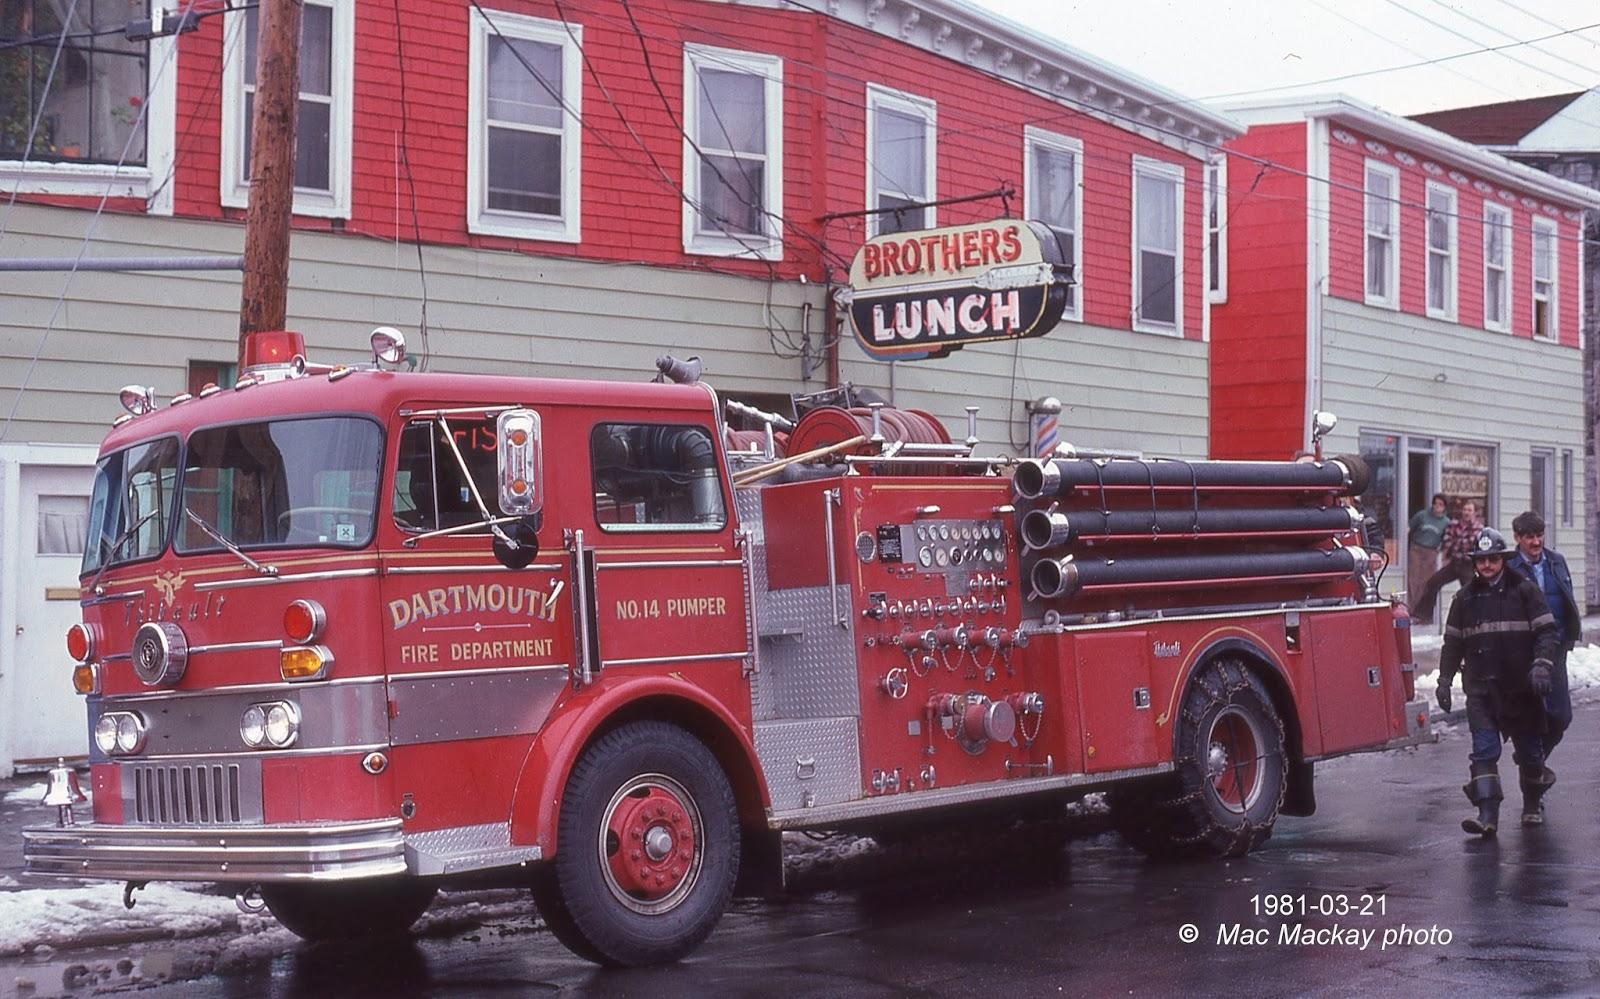 Used International Trucks >> Truckfax: Dartmouth Fire Department